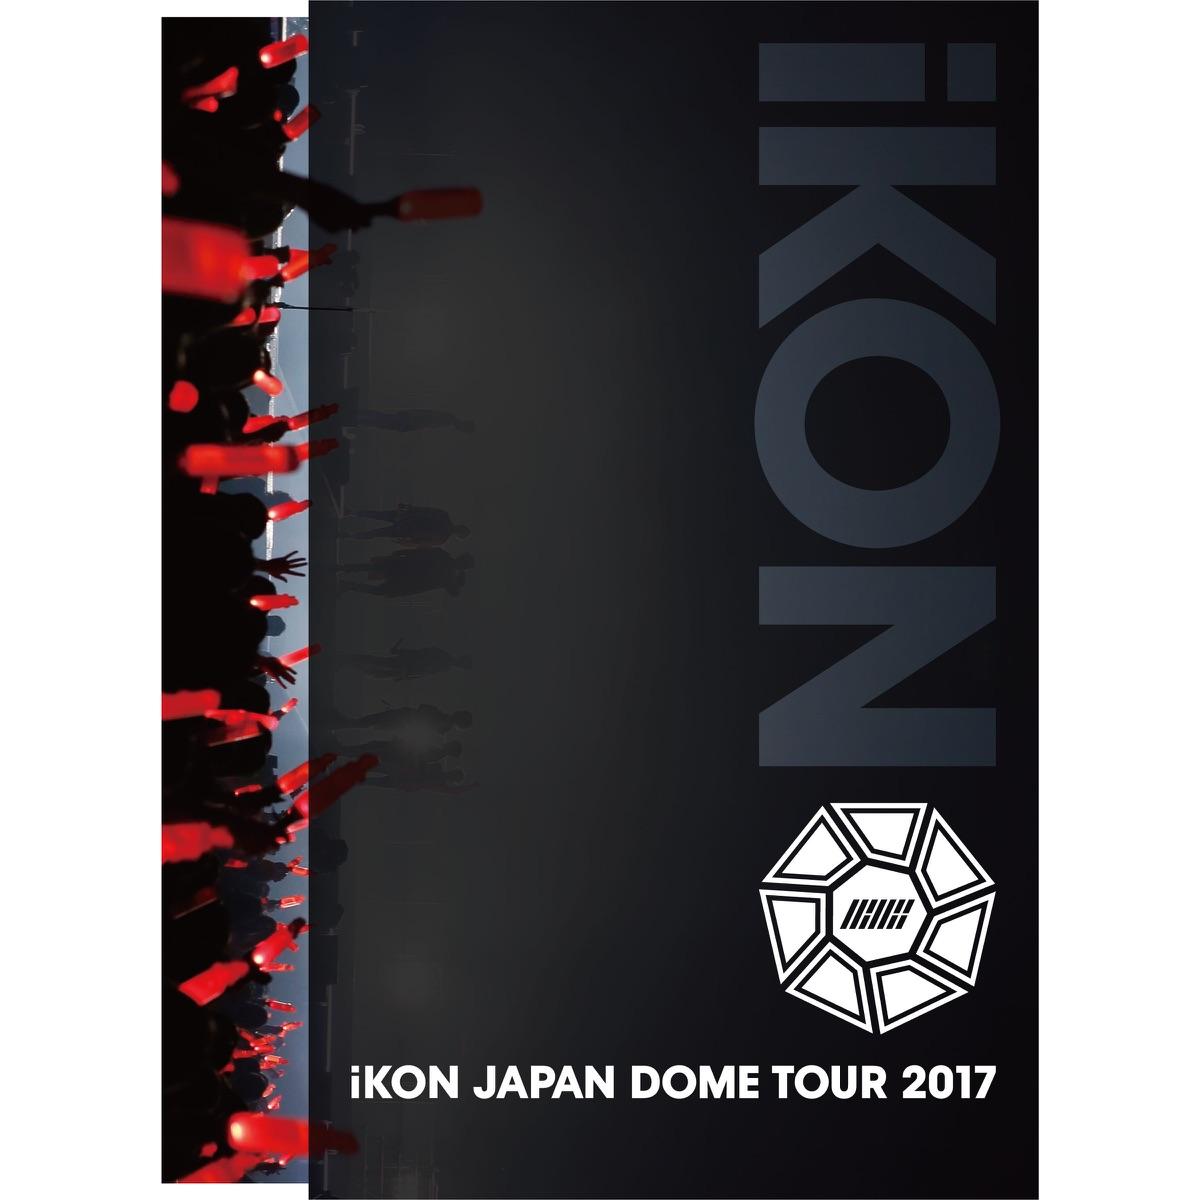 iKON JAPAN DOME TOUR 2017 Album Cover by iKON